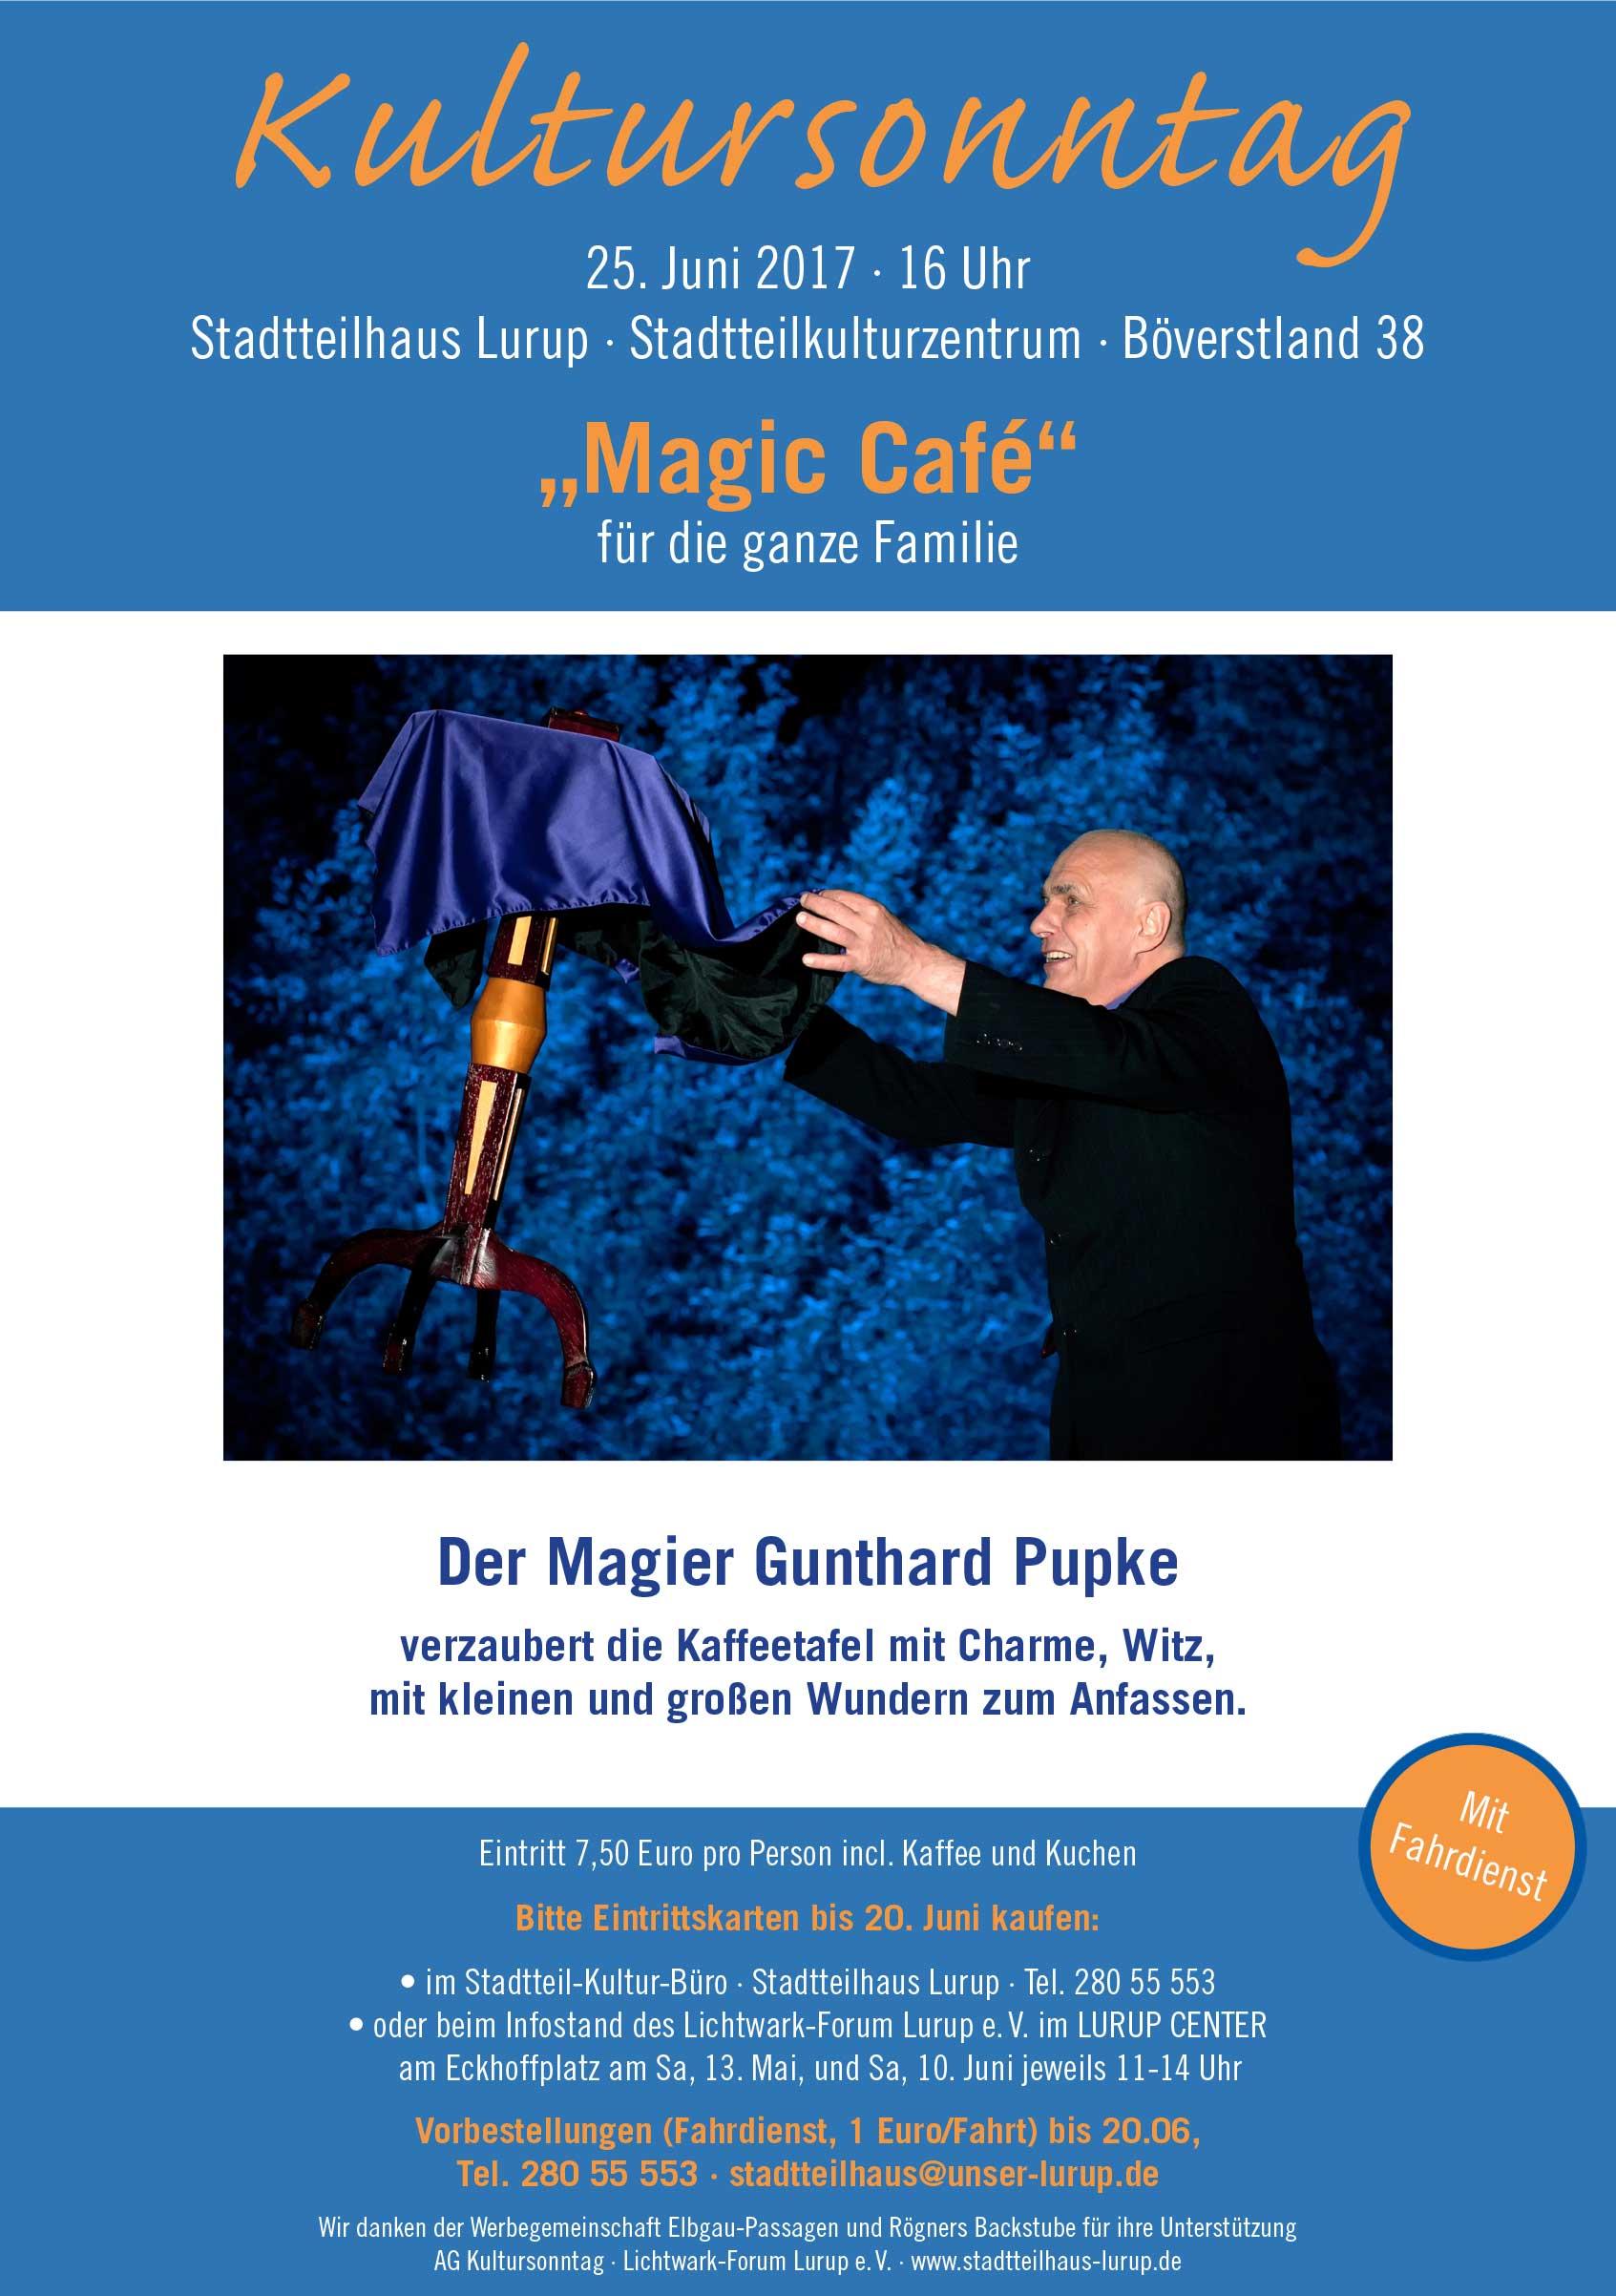 Magic-Cafe-web2017blauschwarz